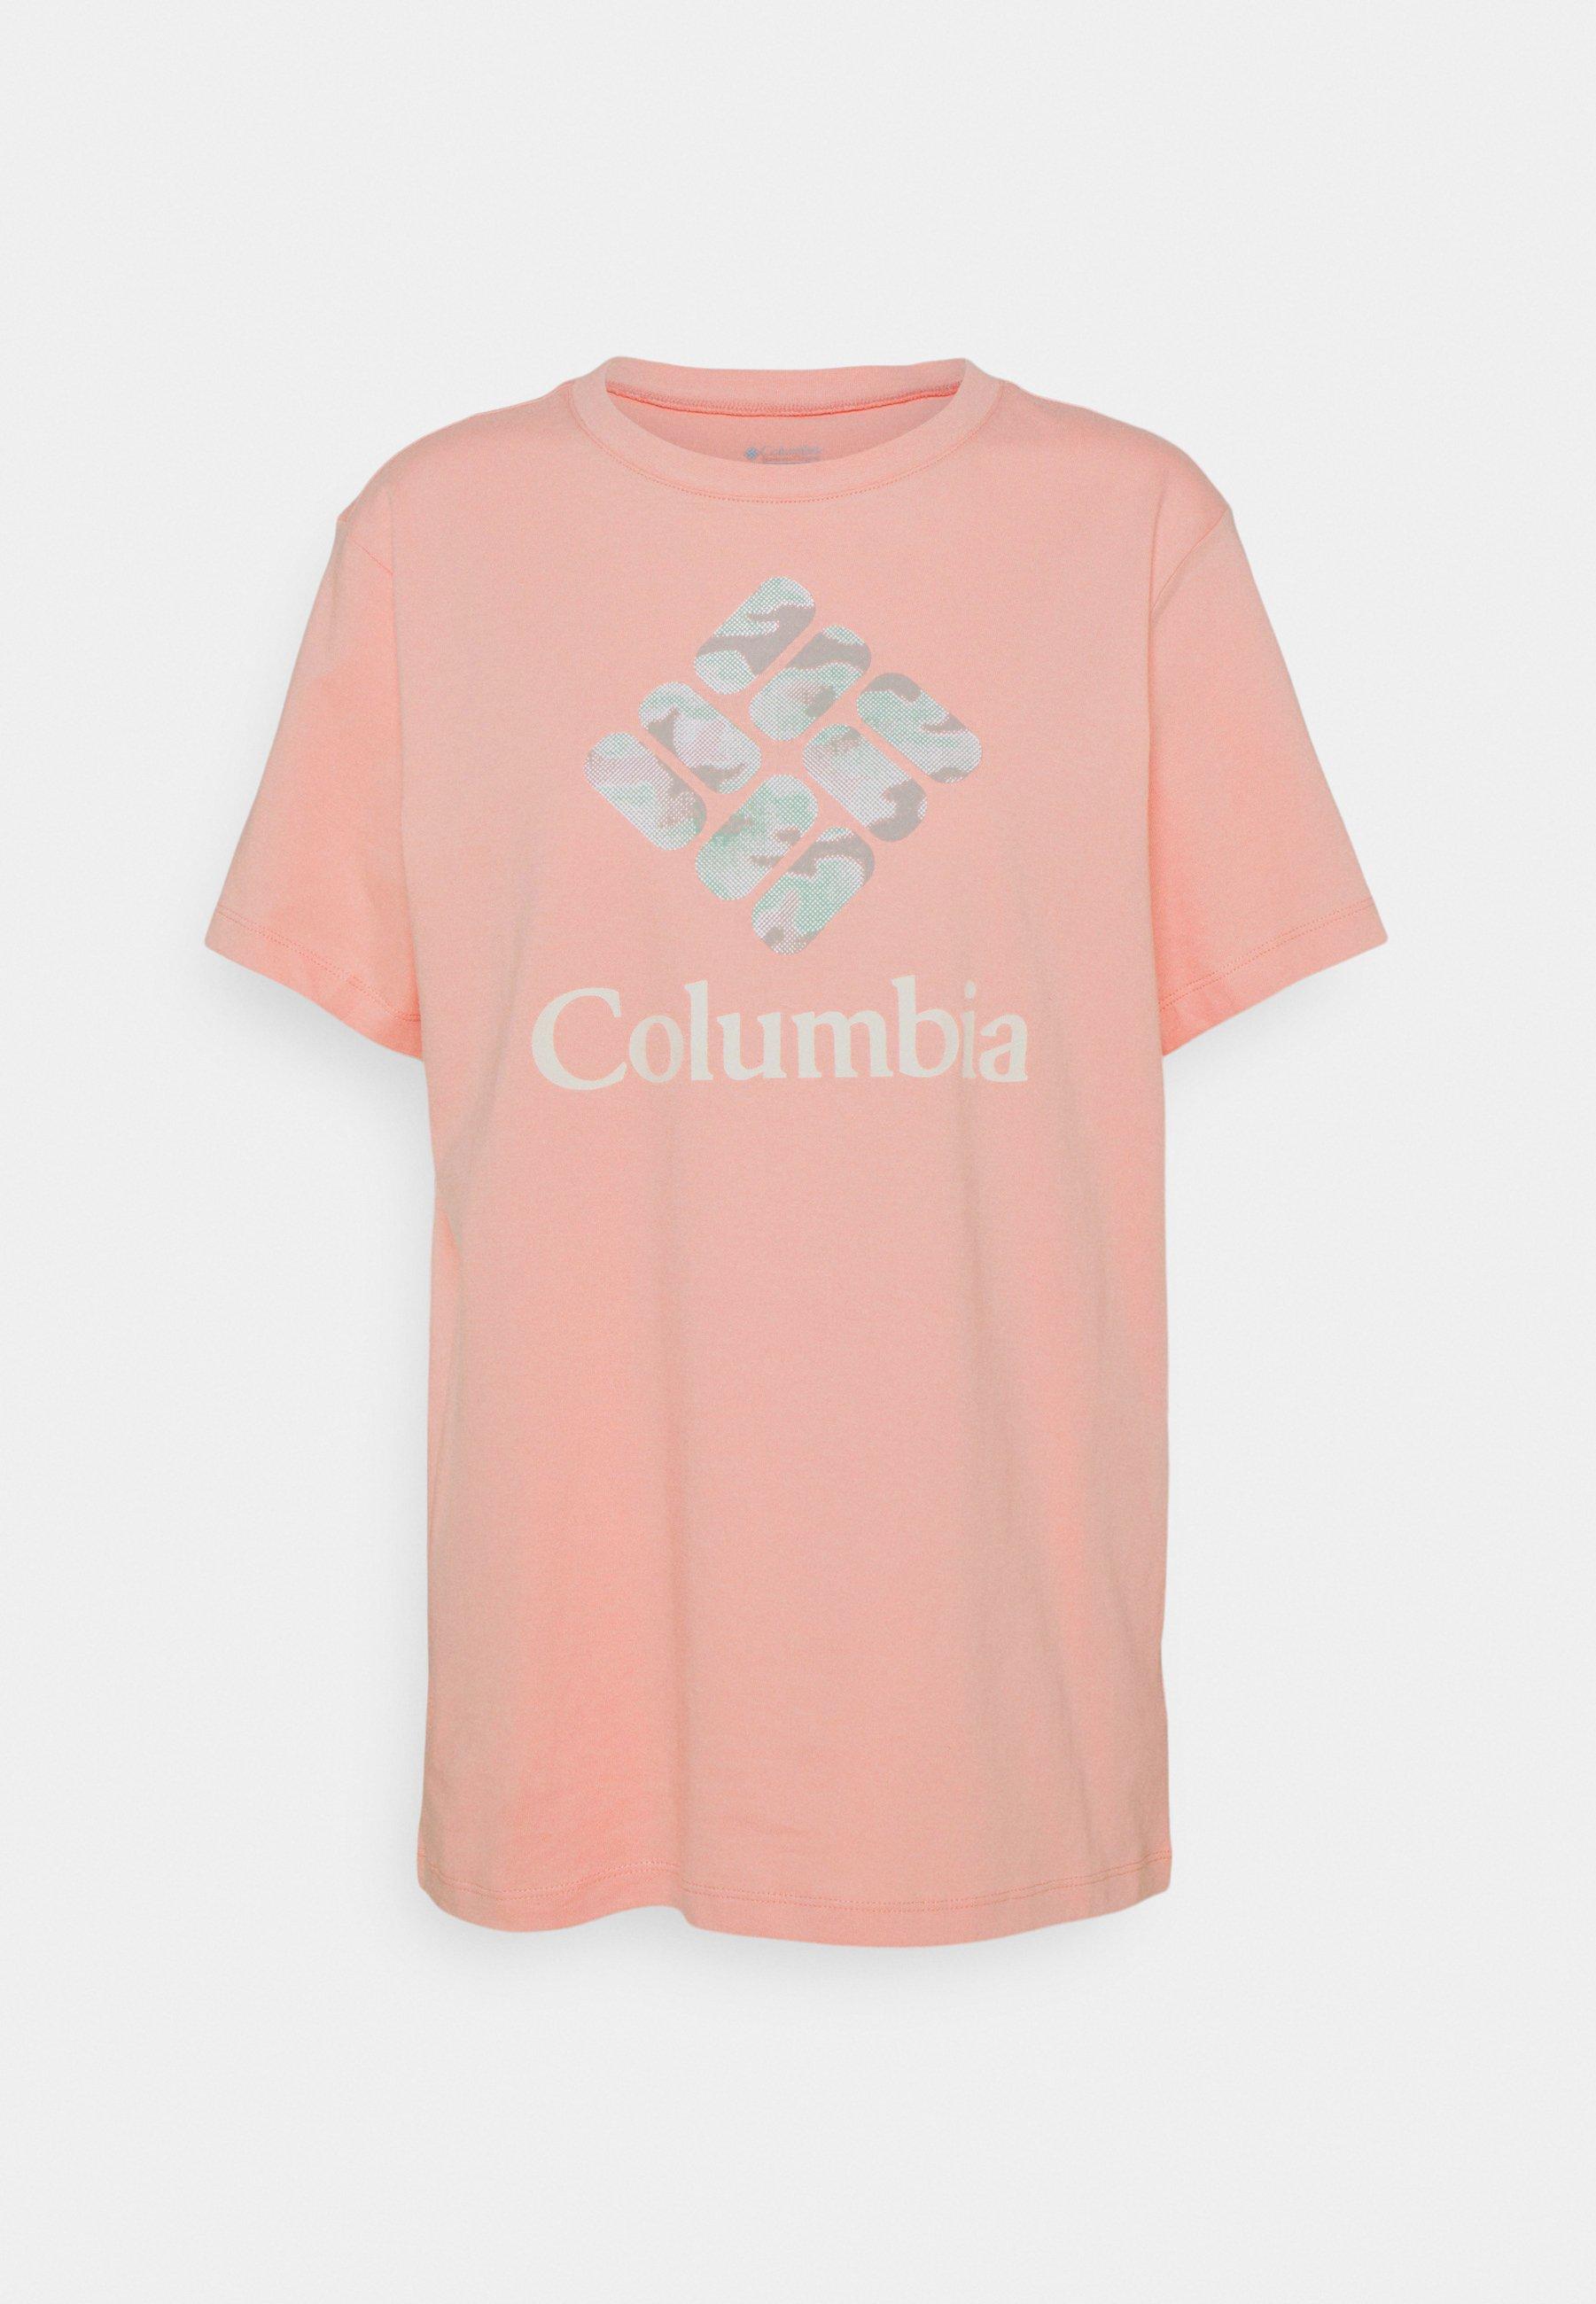 Women PARK™ RELAXED TEE - Print T-shirt - faux pink/aqua tone